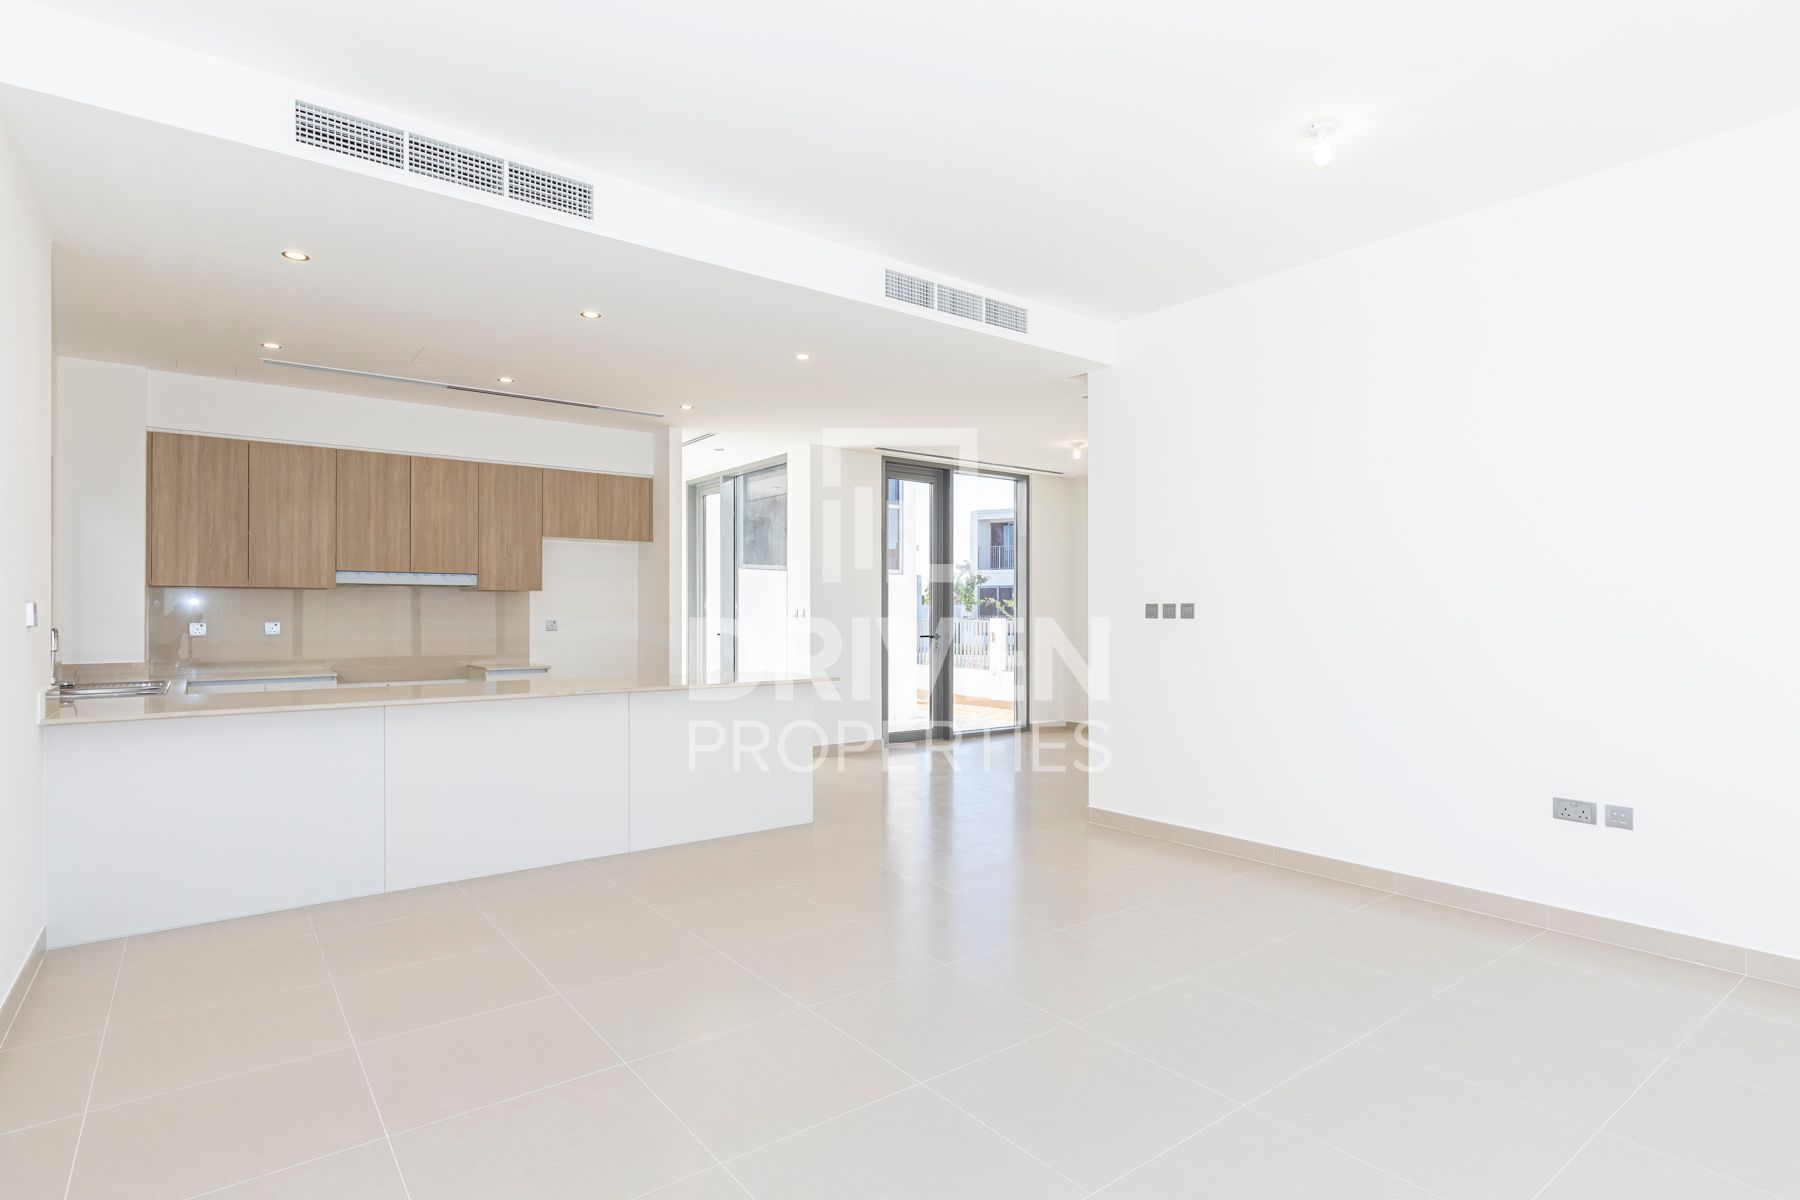 Vacant | Corner 3 Bed Villa | Large Plot